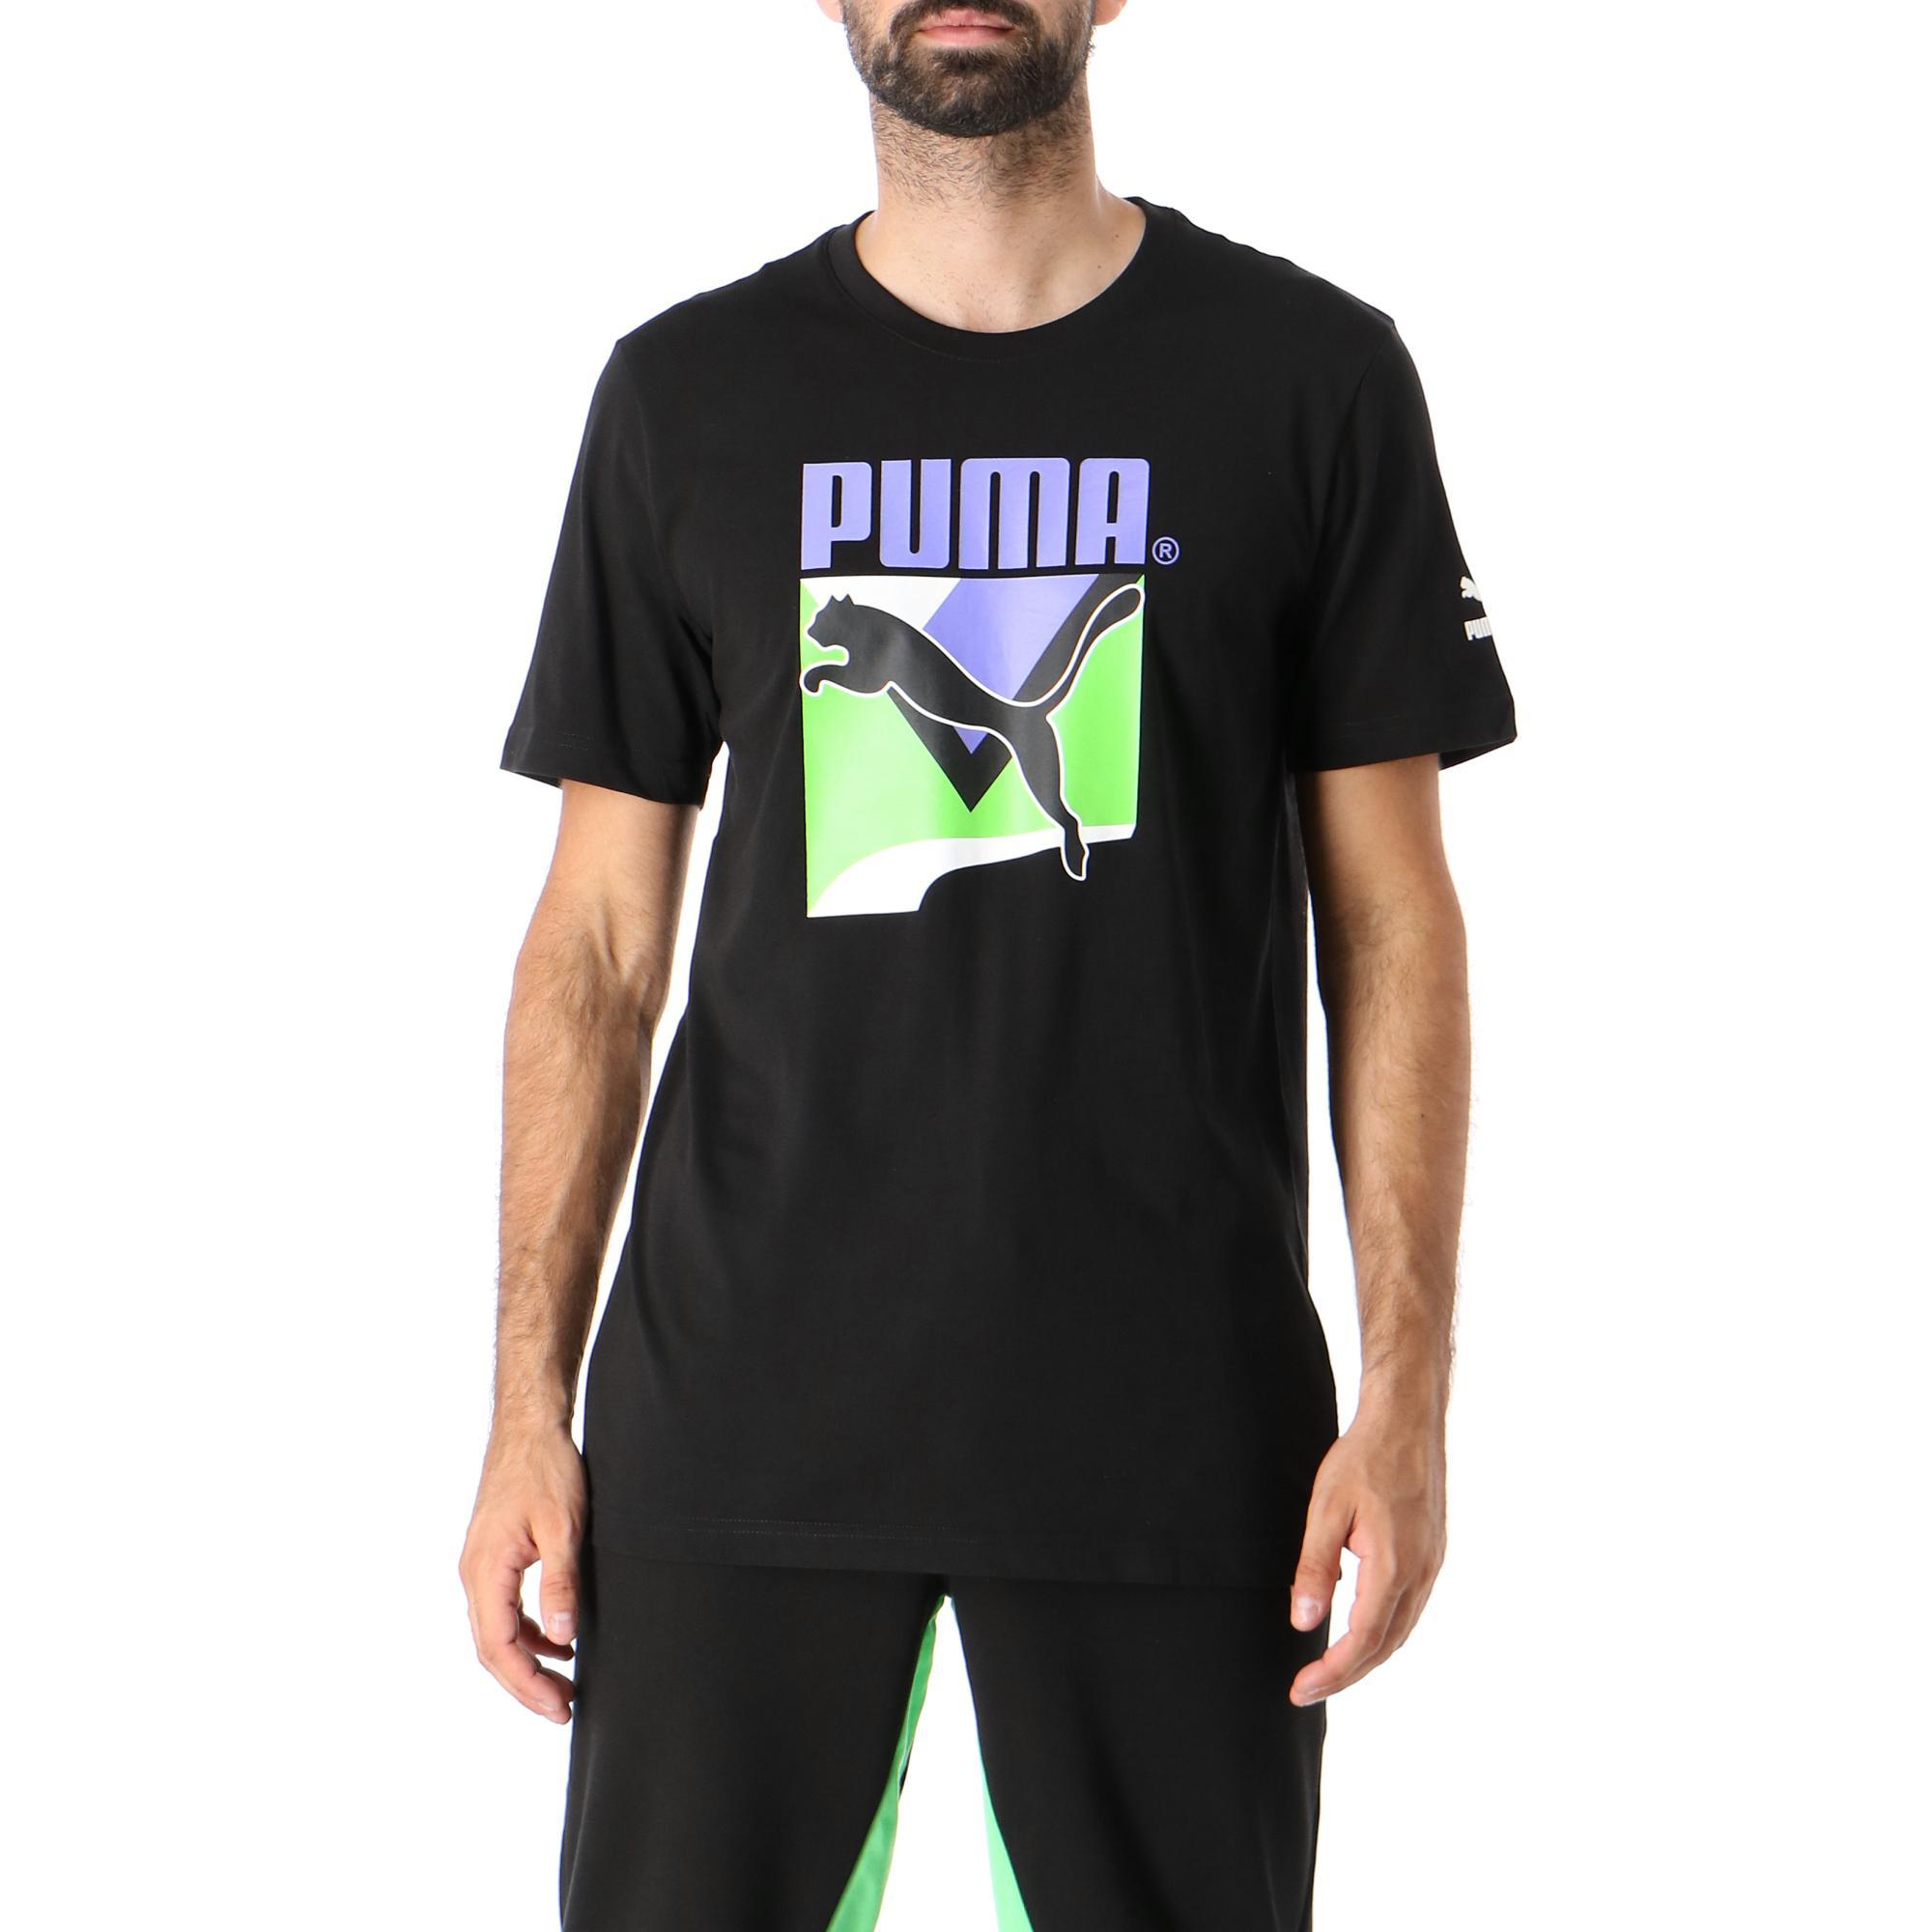 Puma Tfs Graphic Tee Puma black